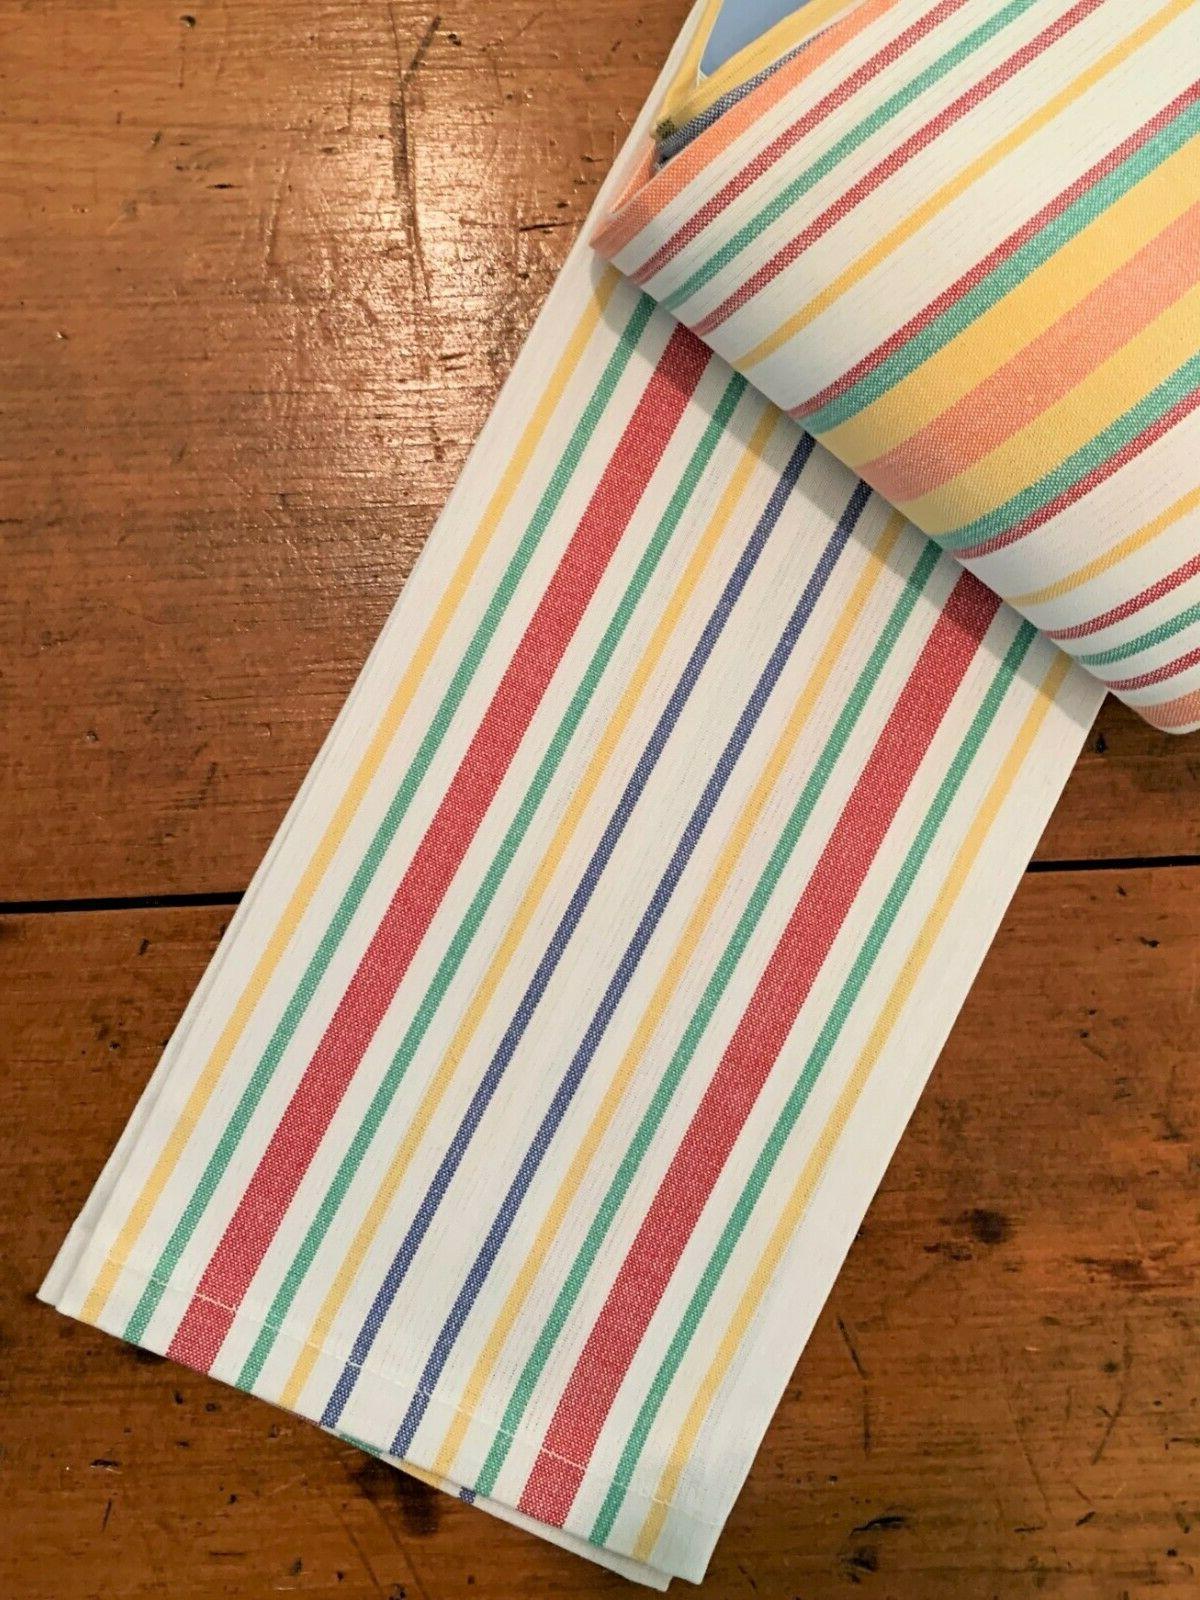 Martha Everyday Vintage/Retro Striped Towels of NWT